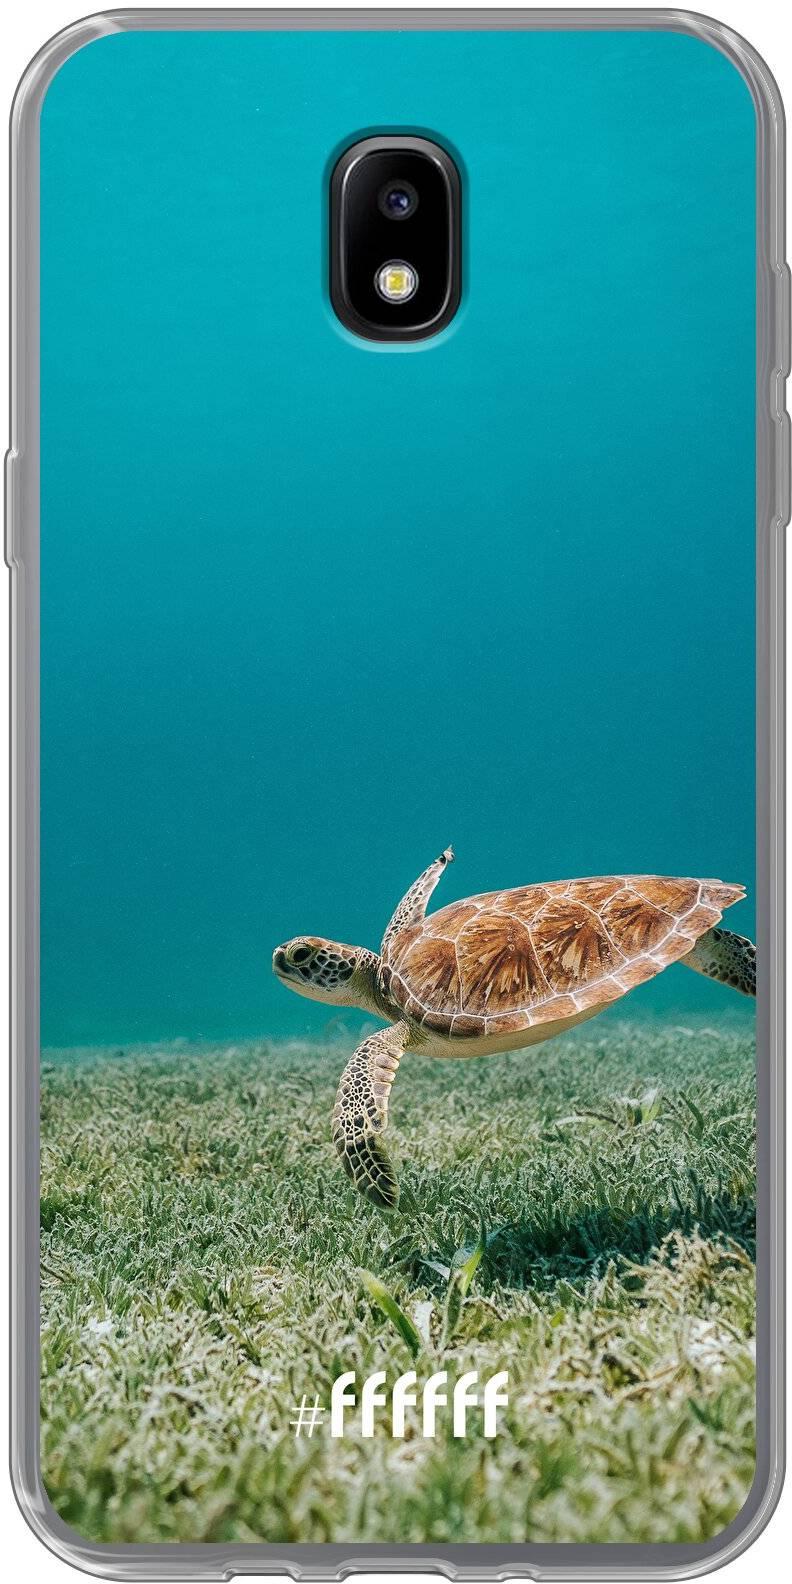 Turtle Galaxy J5 (2017)